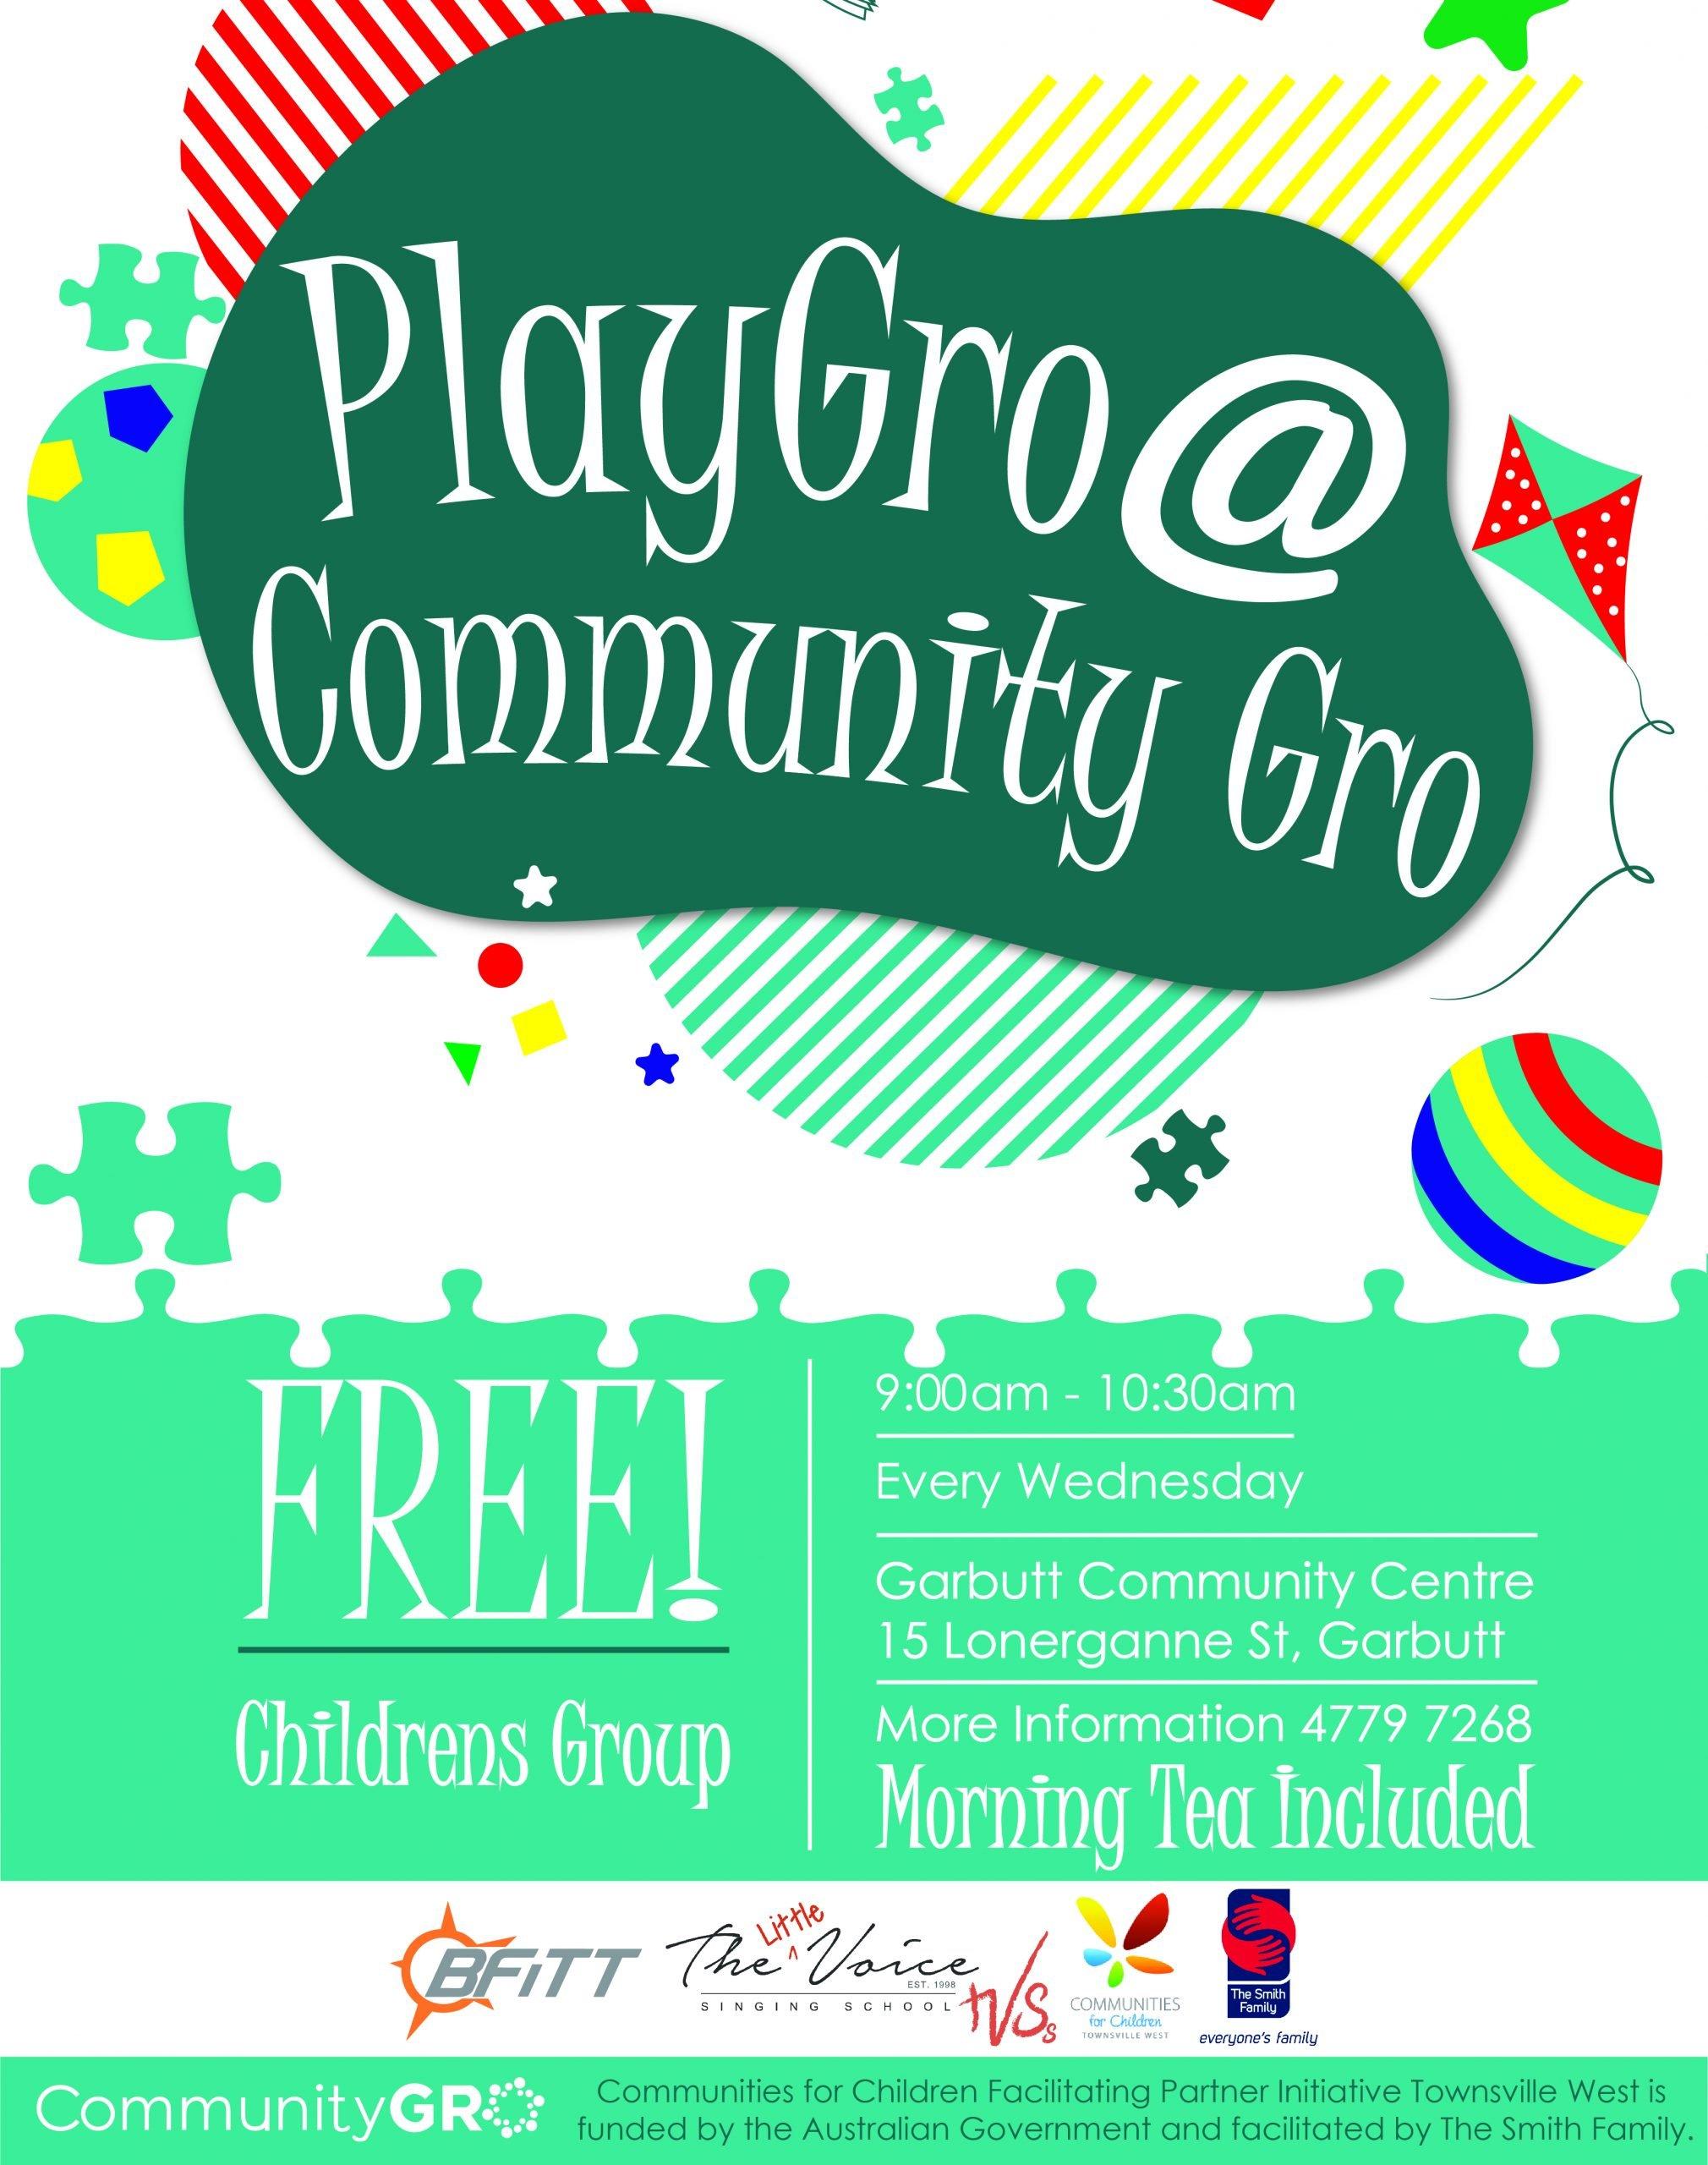 Community Gro – PlayGro at Garbutt Community Centre